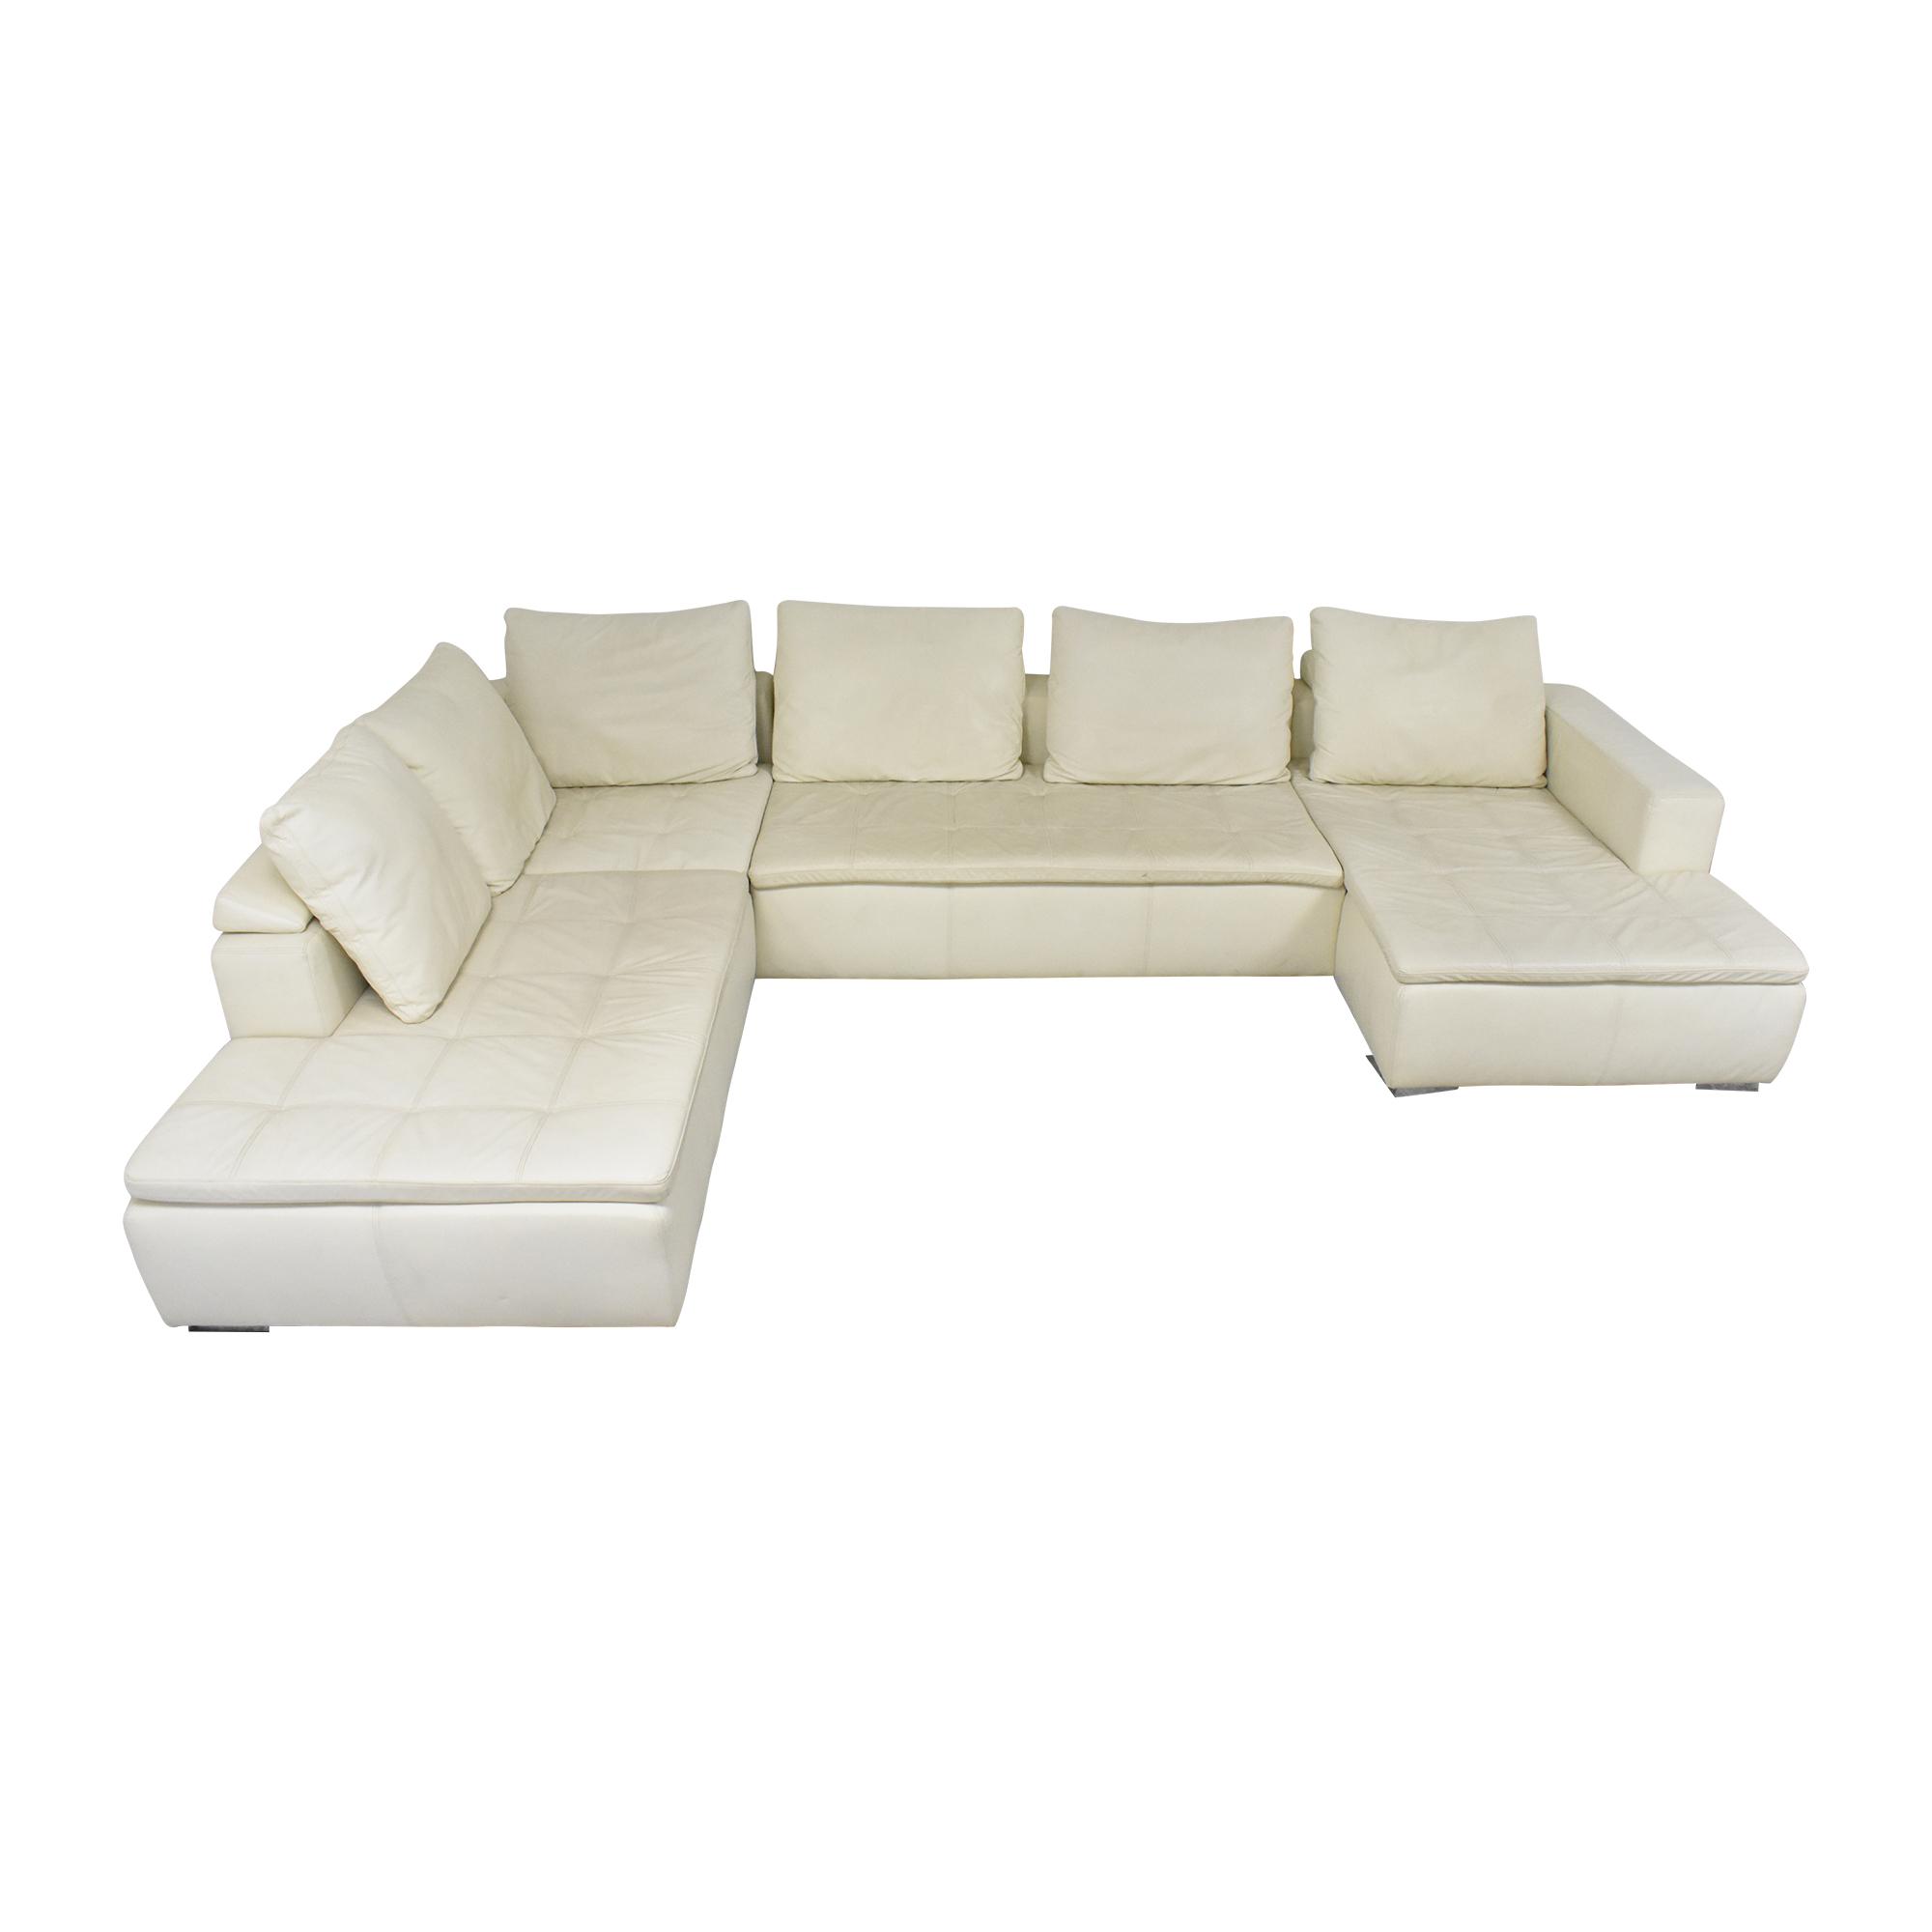 BoConcept BoConcept Mezzo Sectional Sofa white